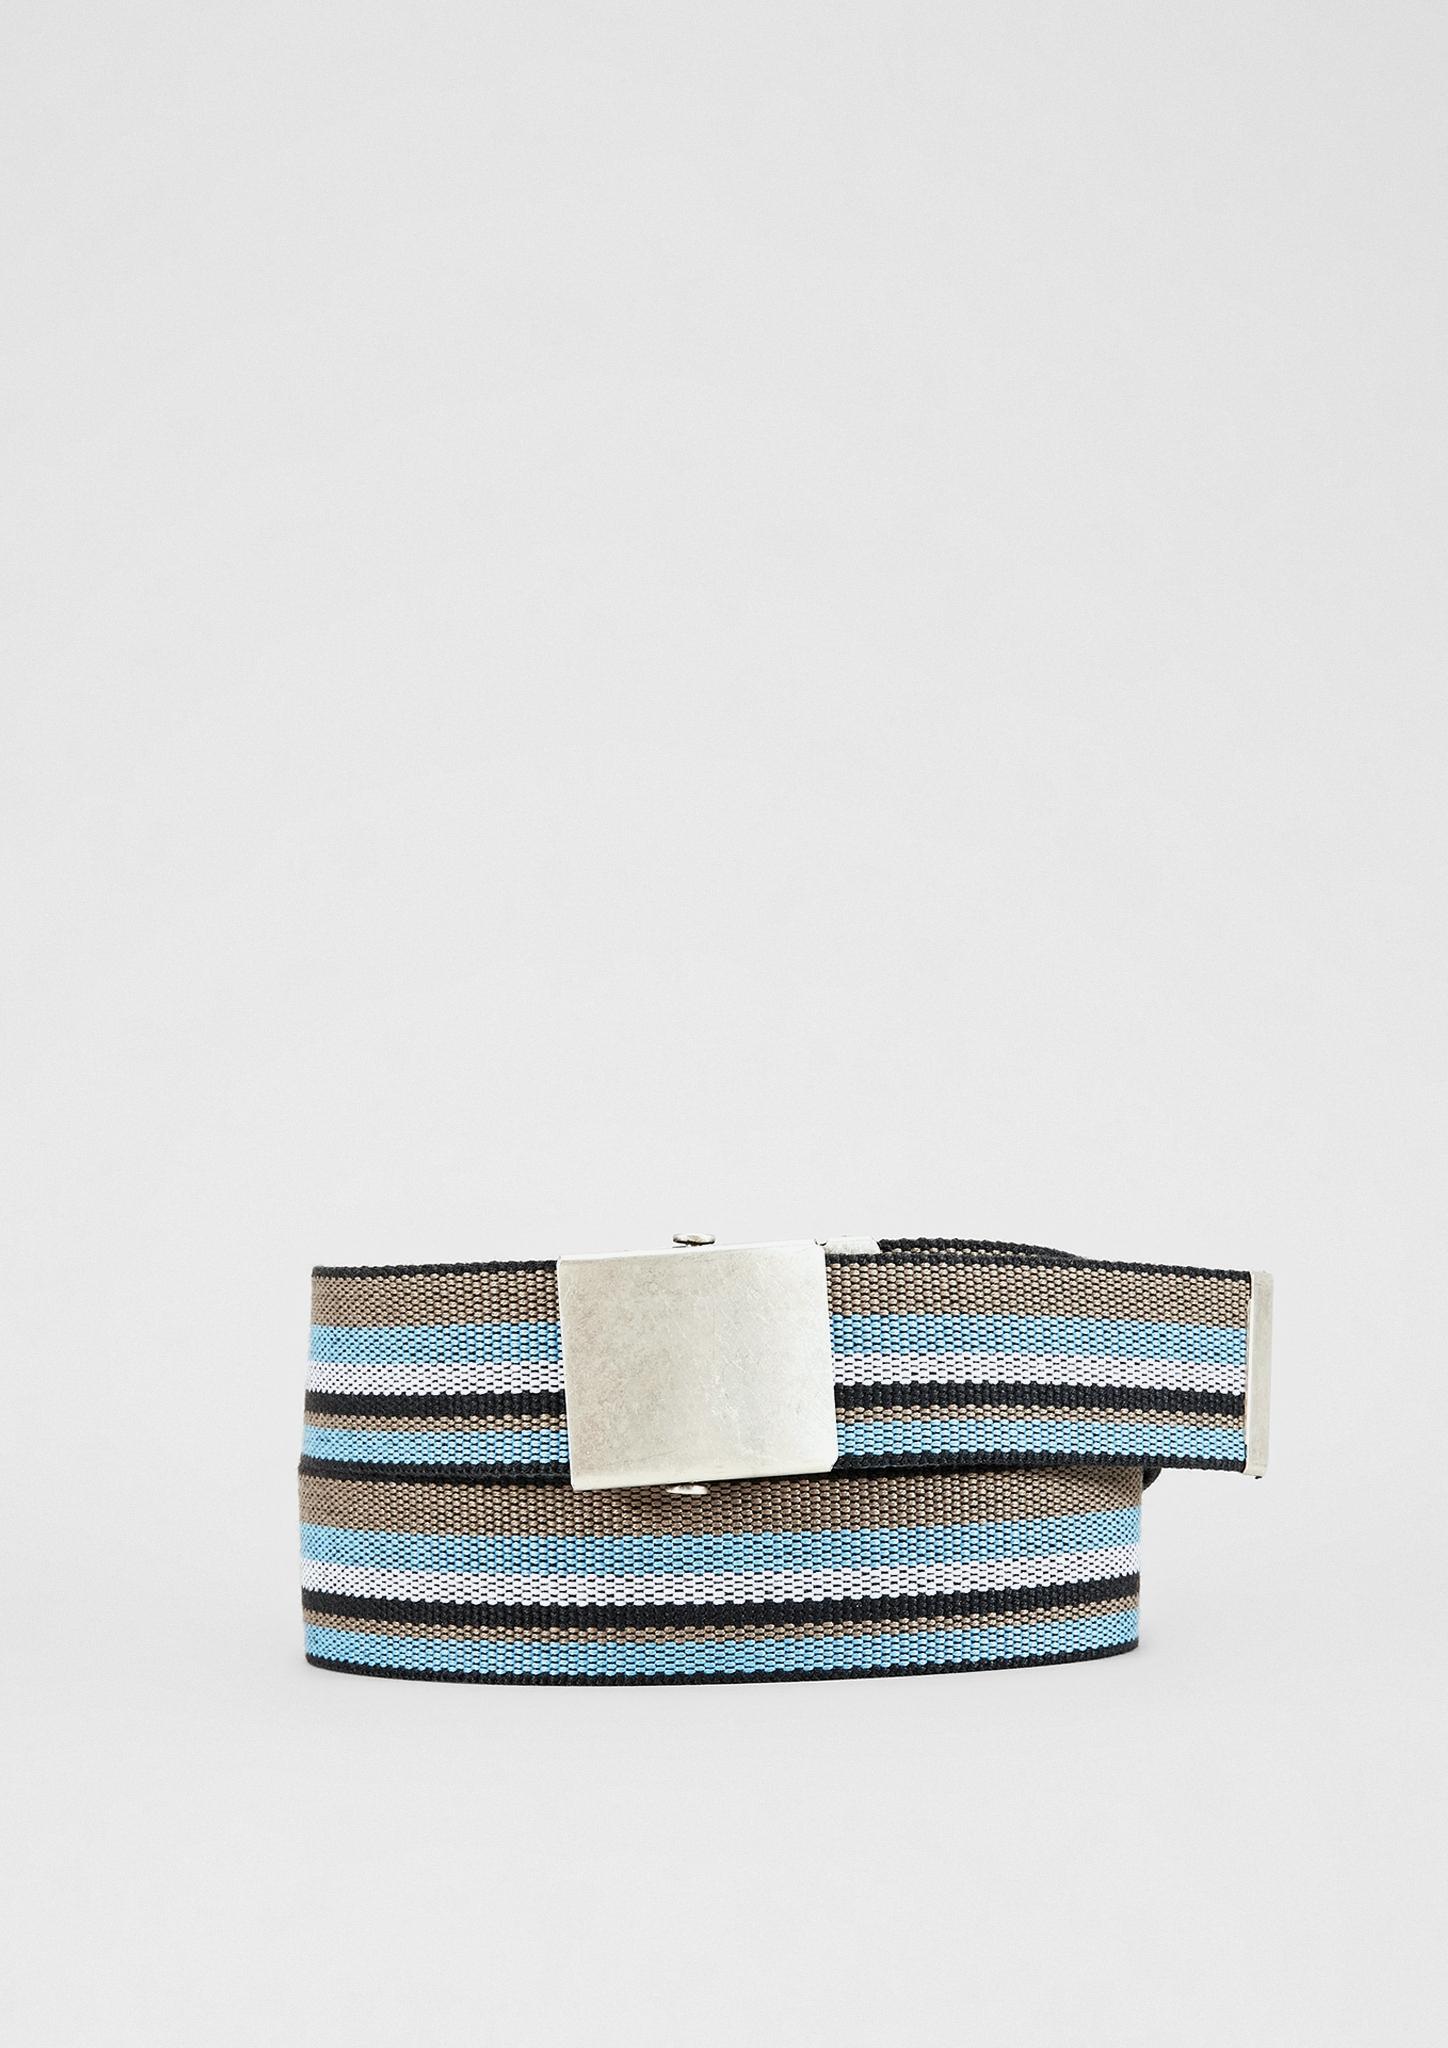 Gürtel | Accessoires > Gürtel > Sonstige Gürtel | Blau/grün | 80% polyester -  20% viskose | s.Oliver